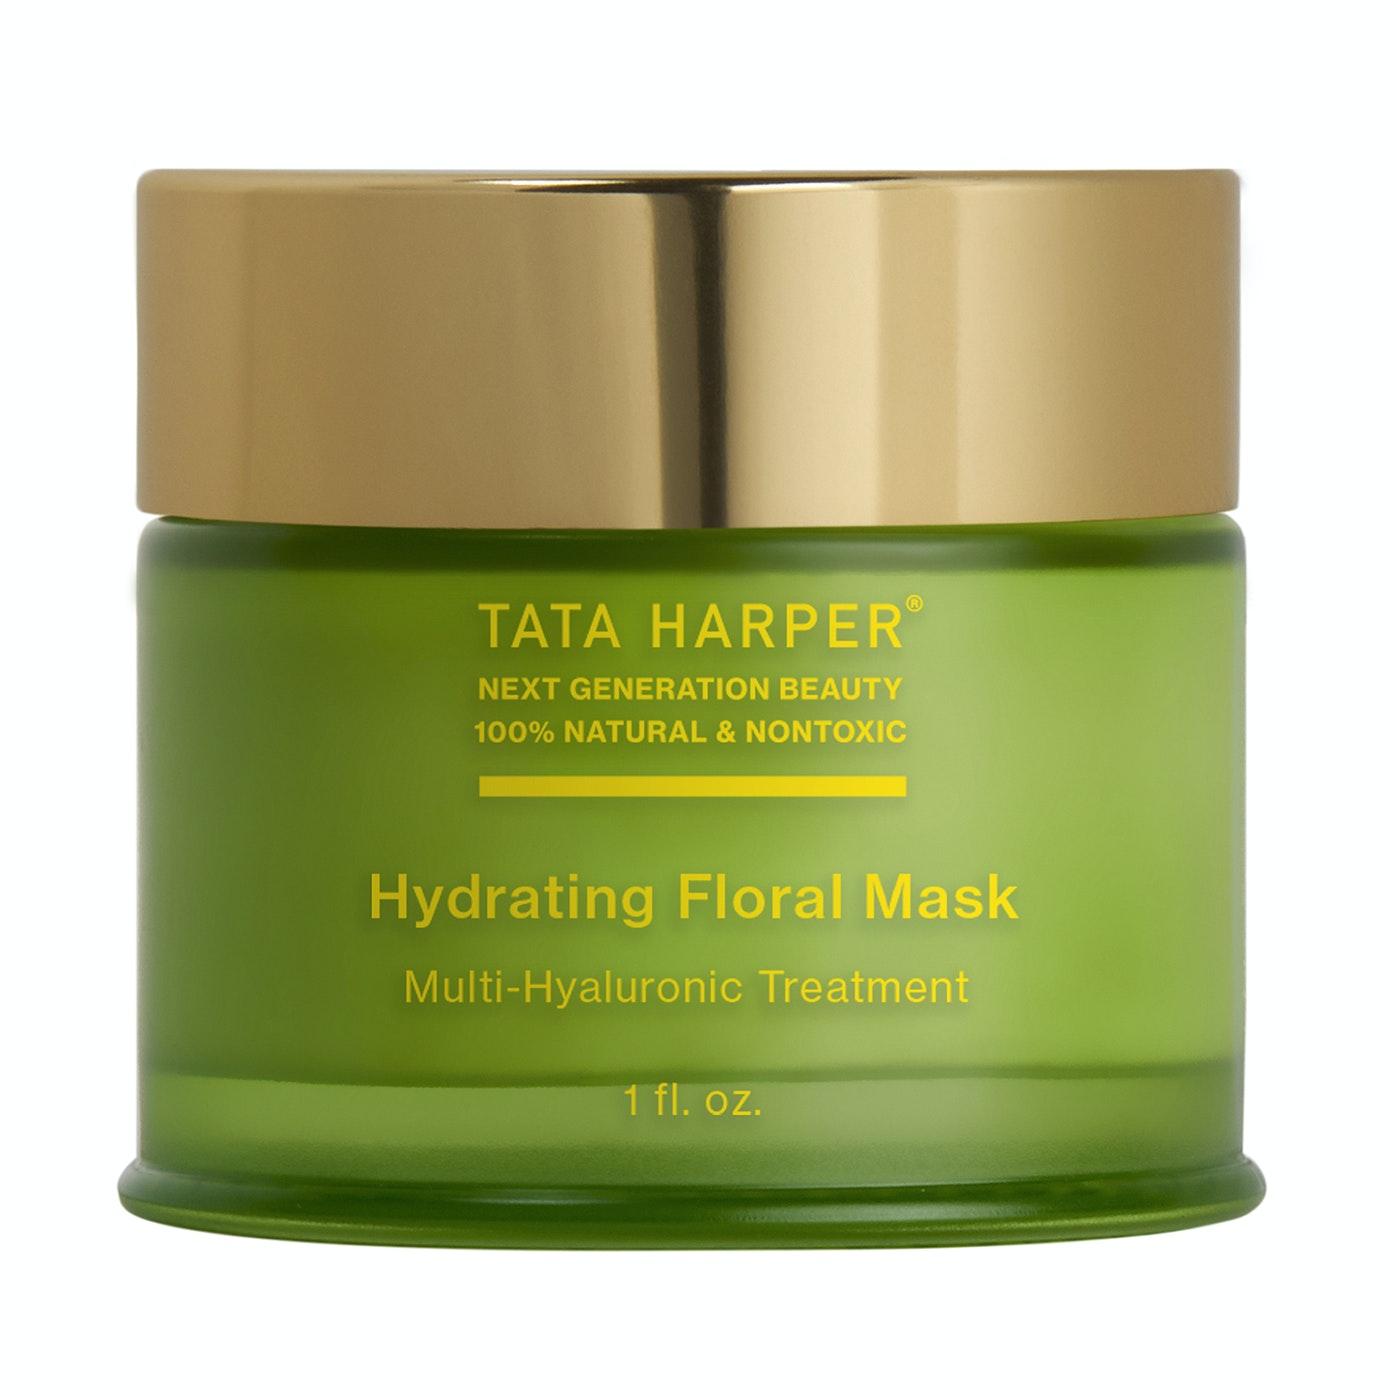 Tata Harper™ Hydrating Floral Mask